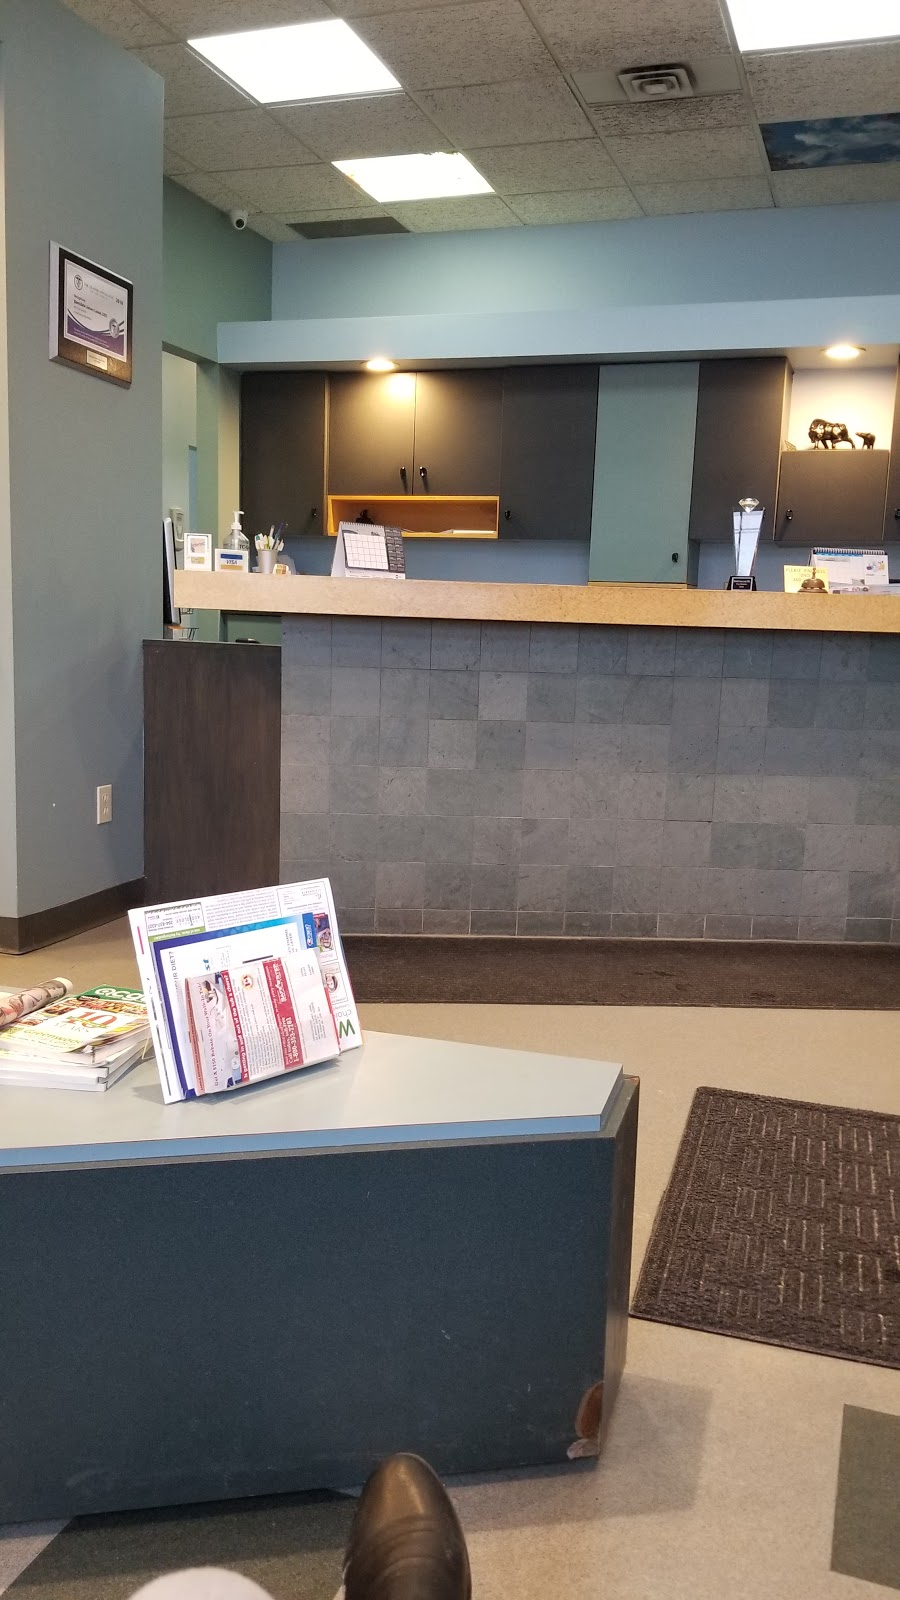 Westbrook Dental Clinic | dentist | 100 Keewatin St, Winnipeg, MB R3E 3C6, Canada | 2046336200 OR +1 204-633-6200